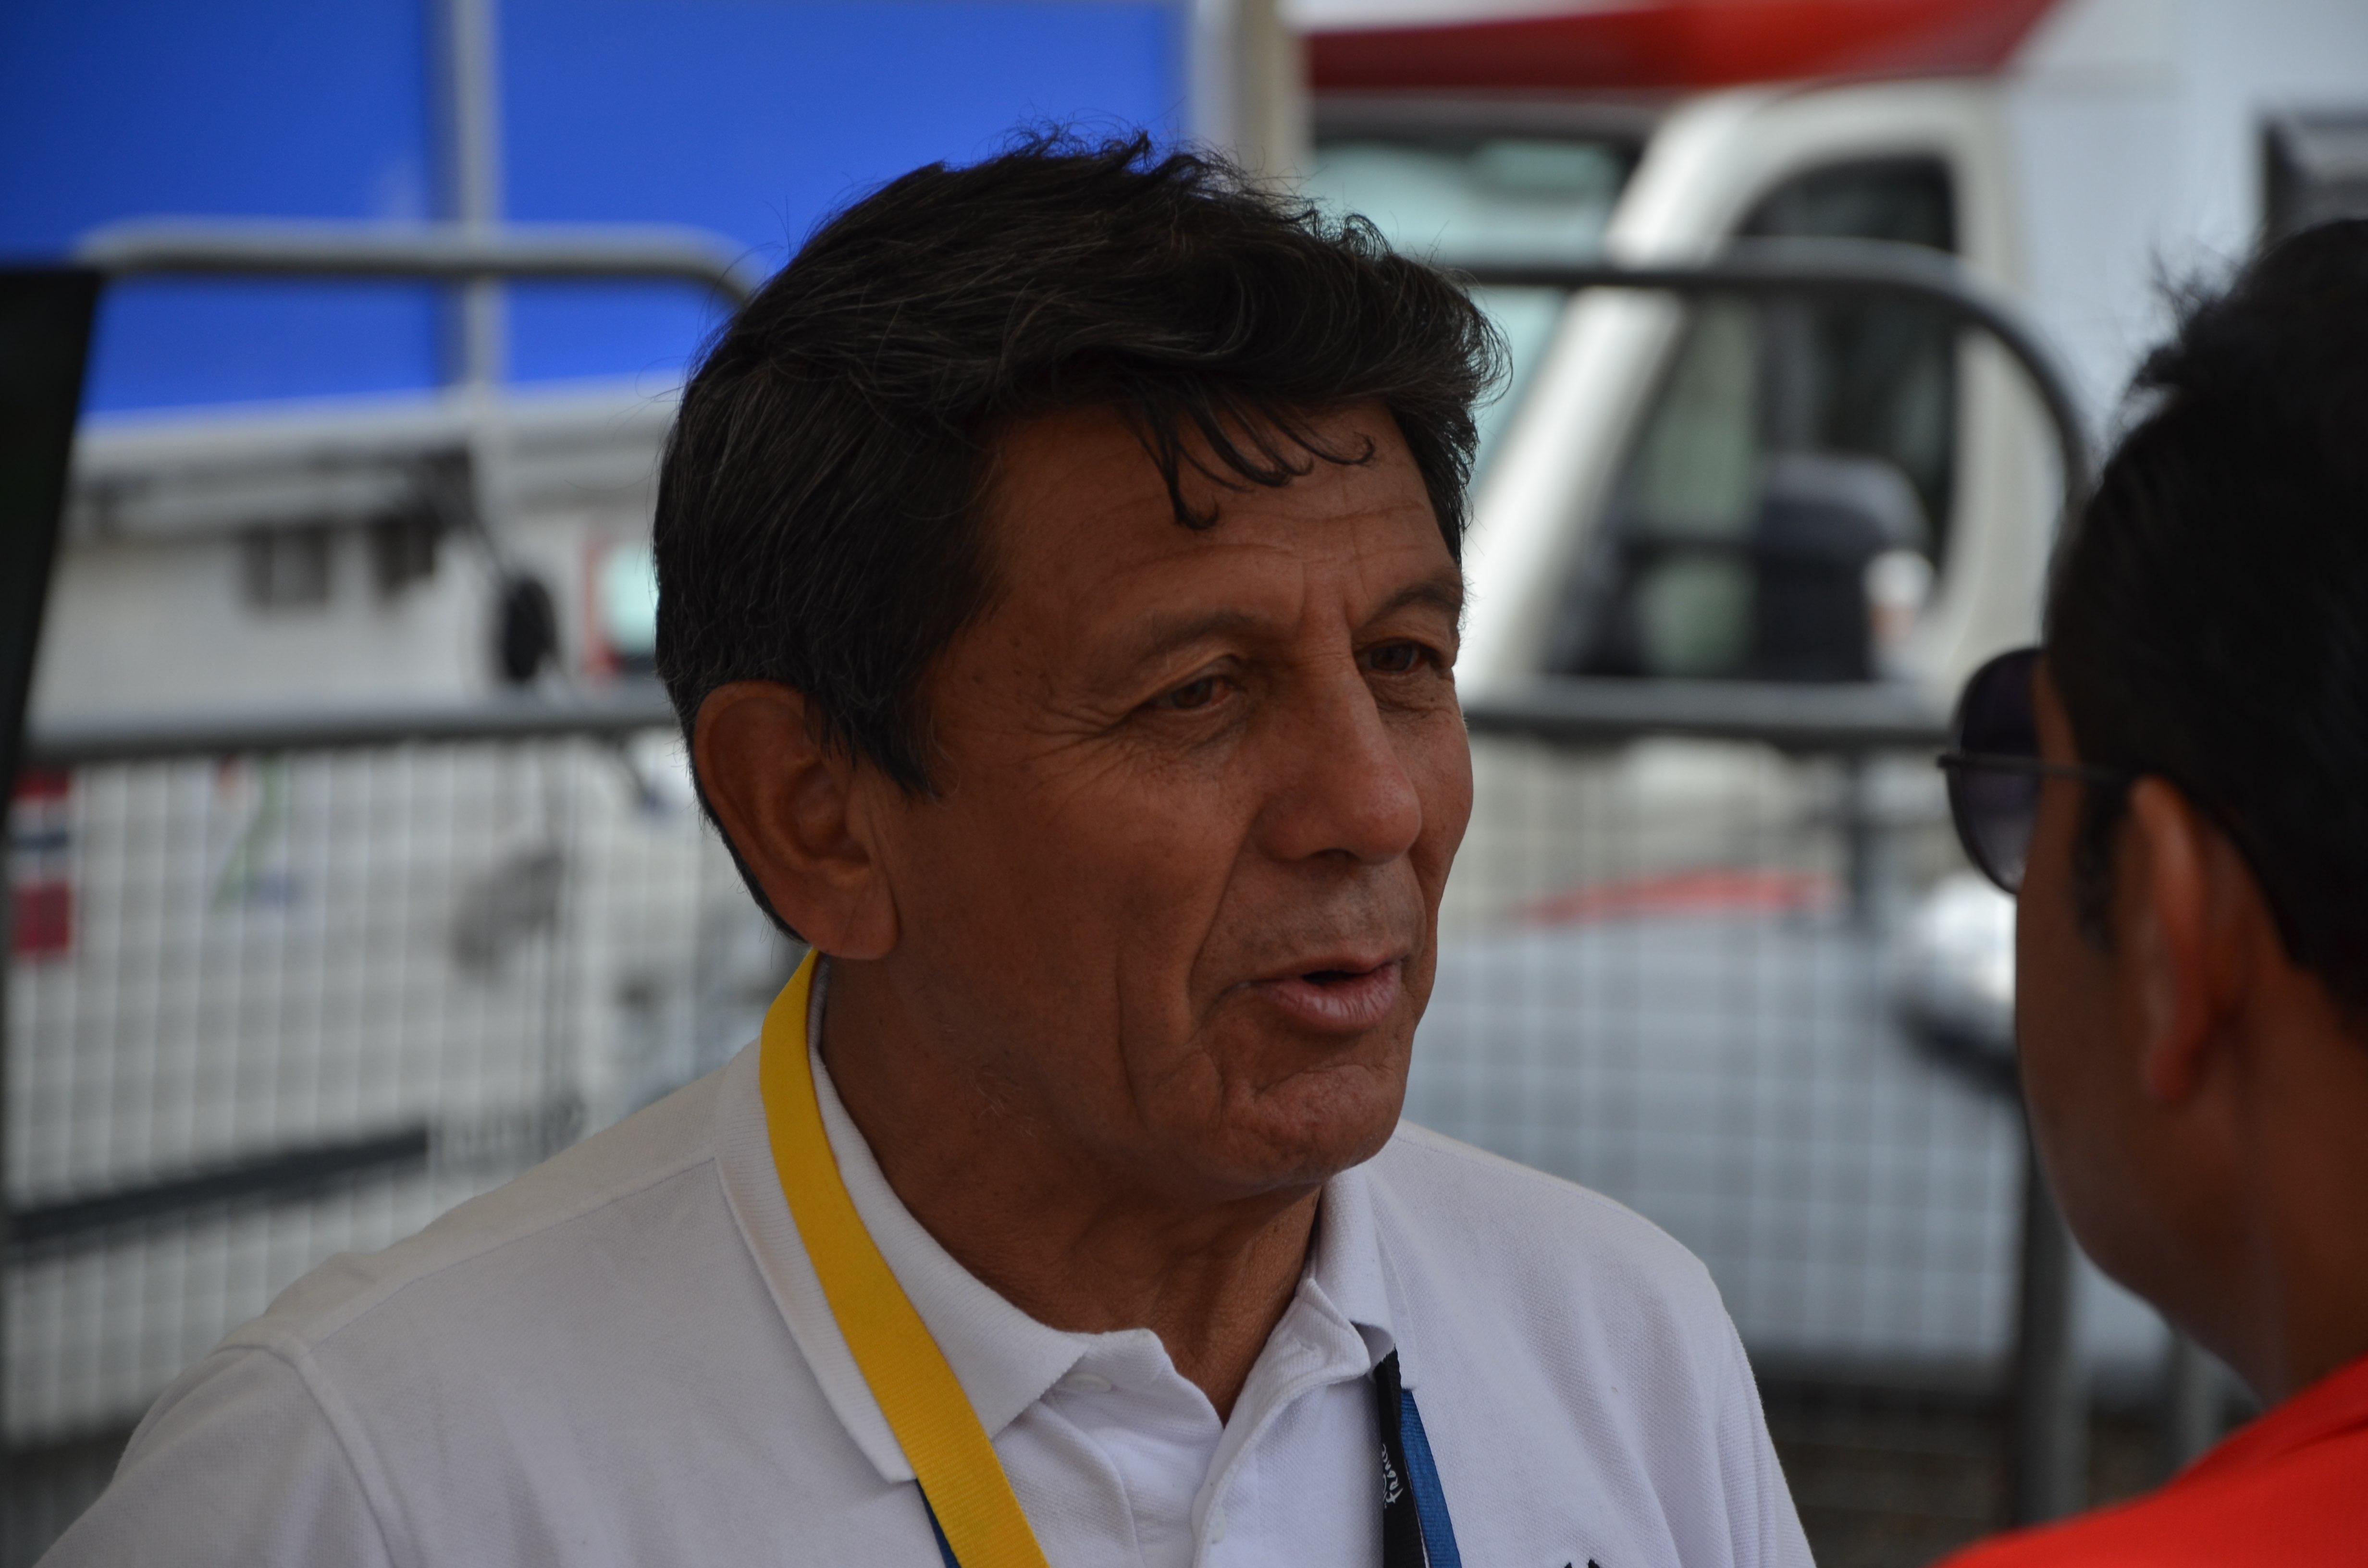 Hector Urrego